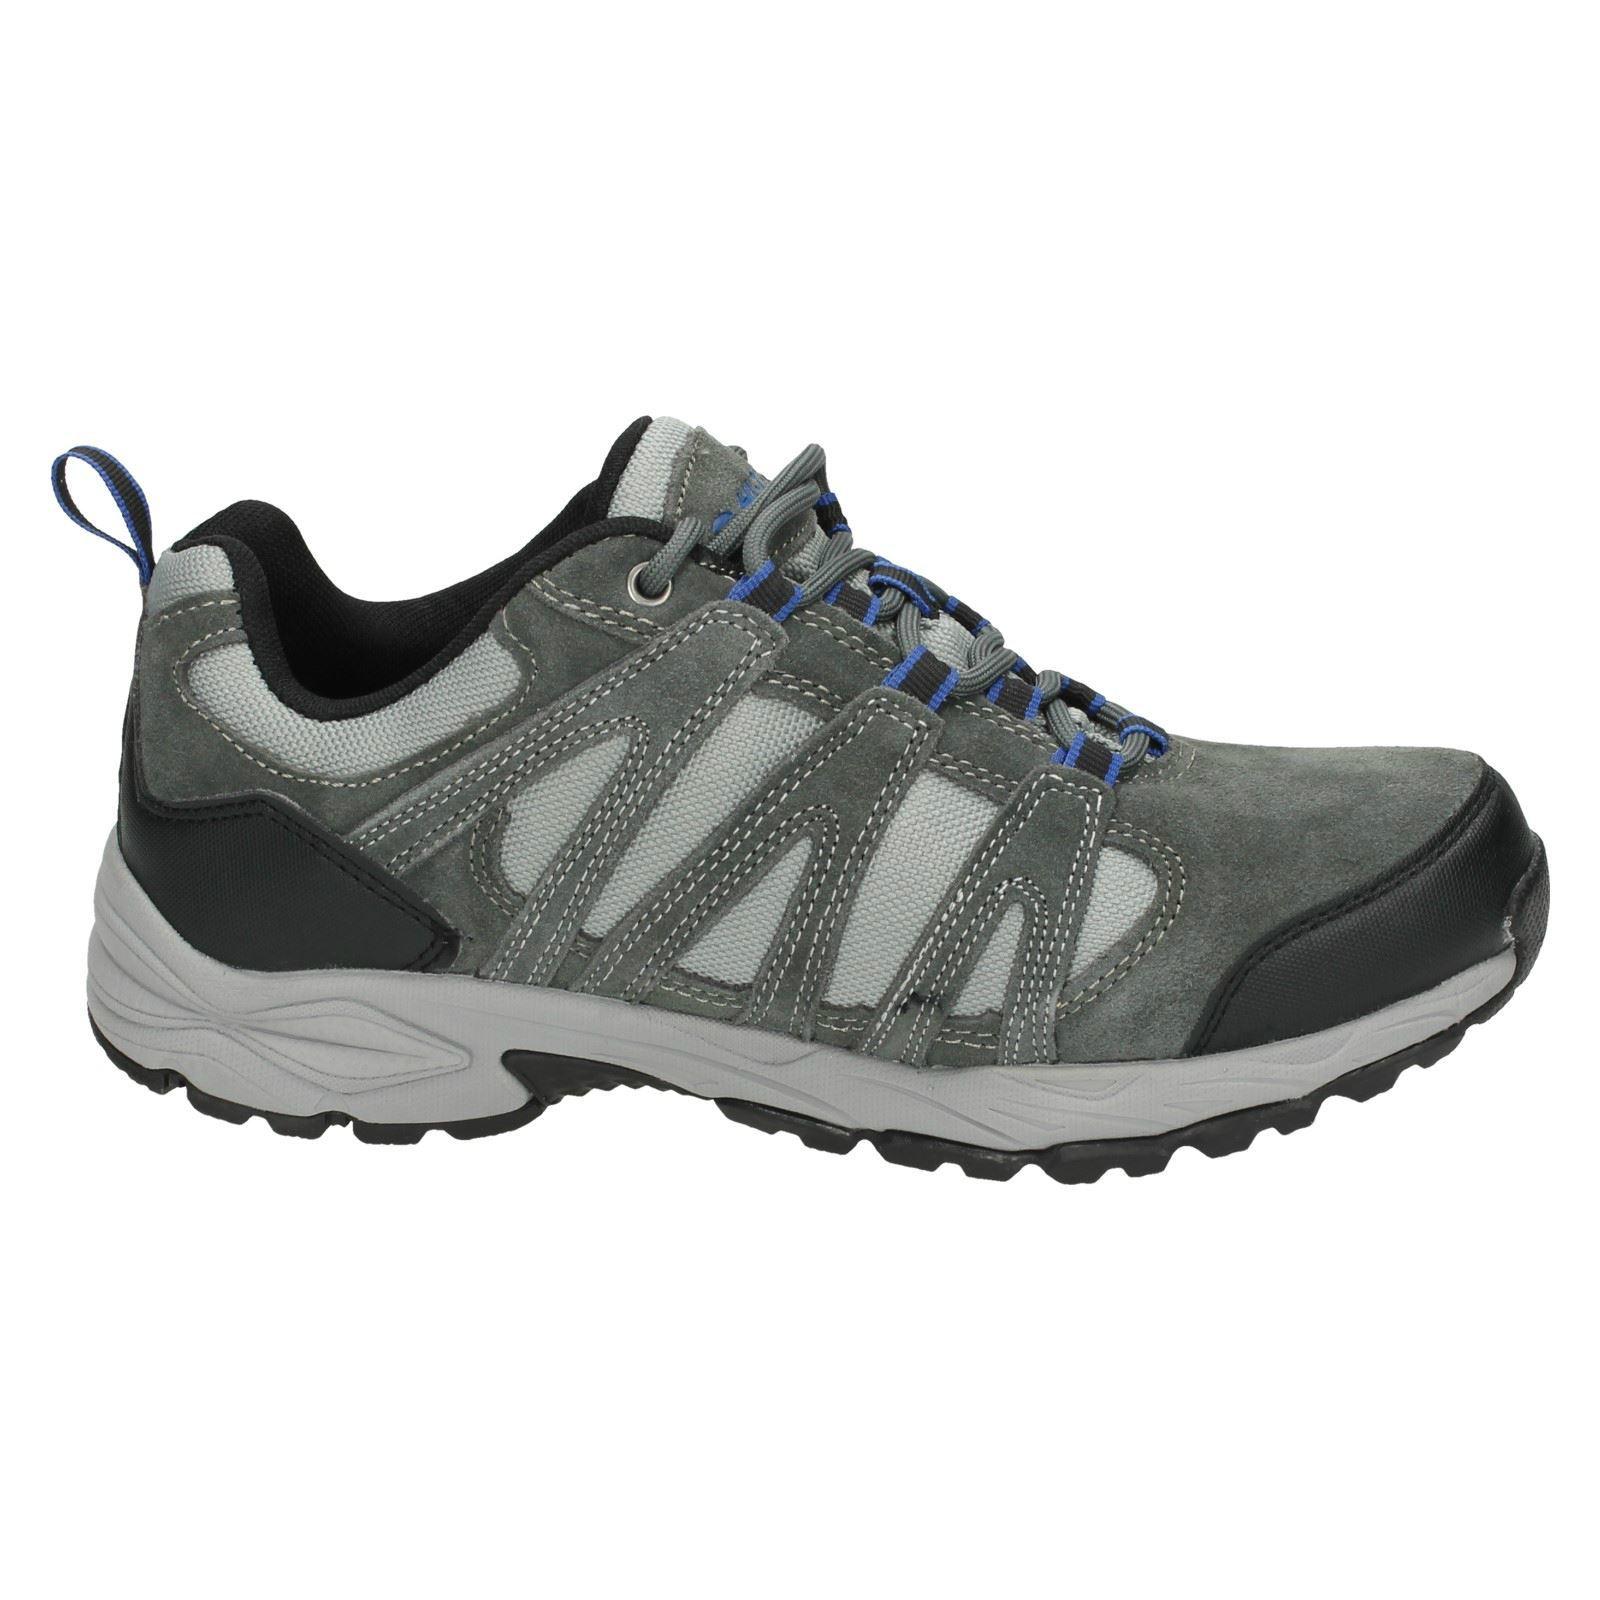 mens hi tec waterproof walking shoes the style alto ii